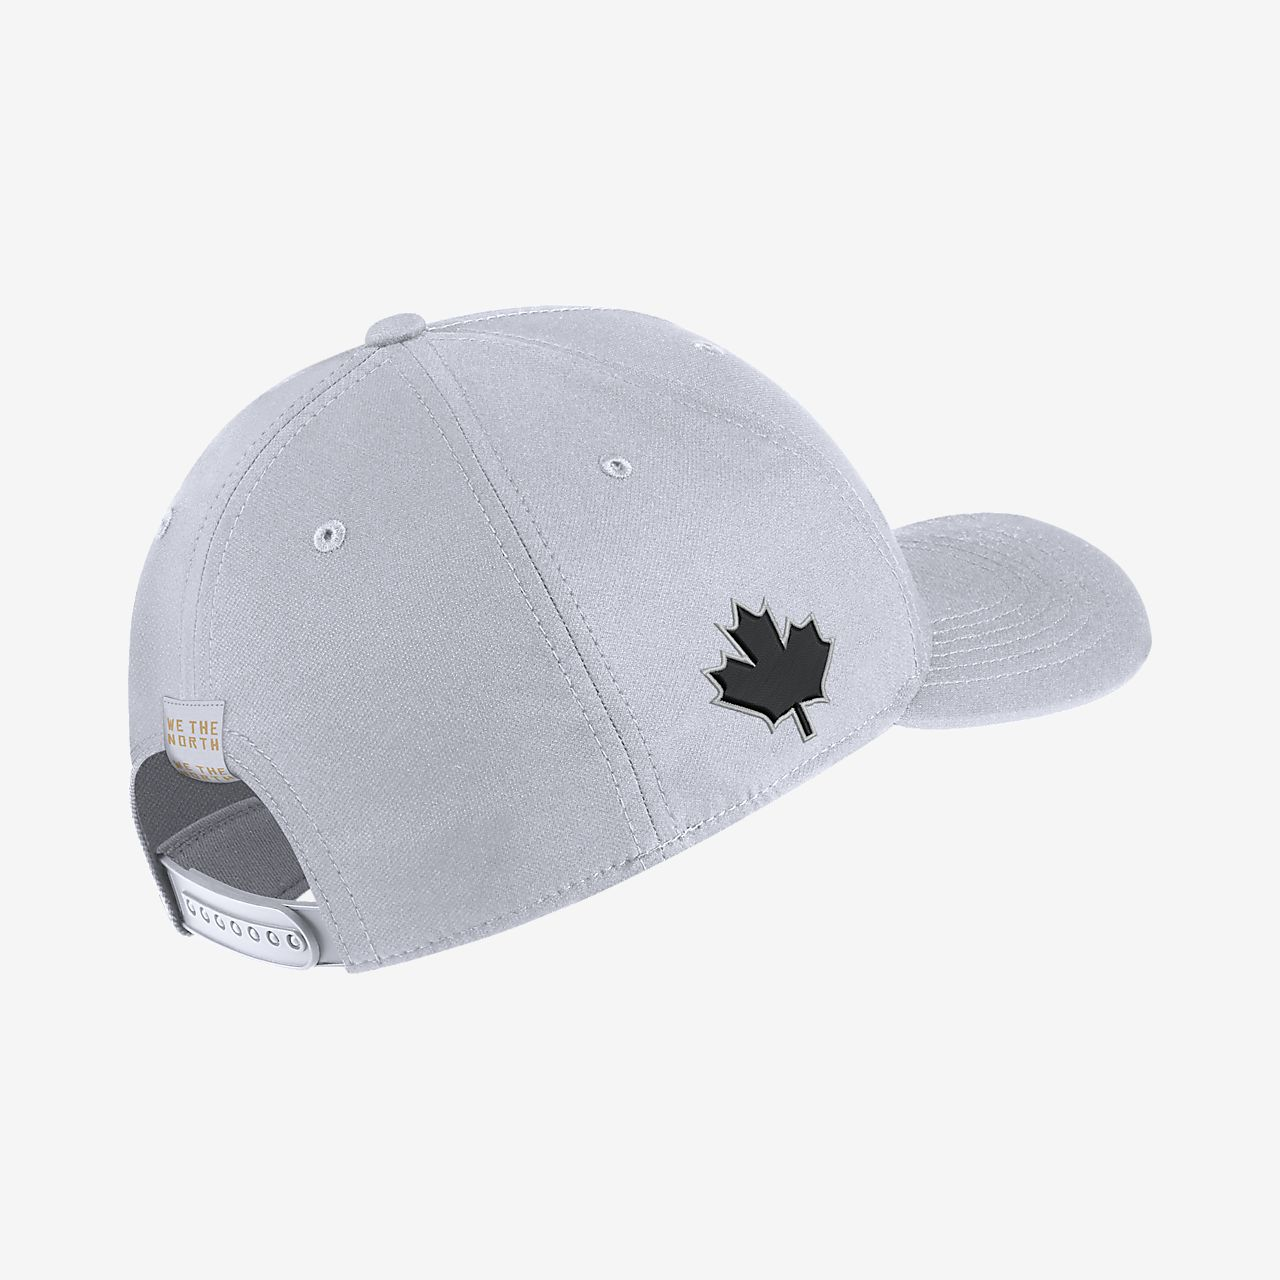 ef726954ddb Toronto Raptors City Edition Nike AeroBill Classic99 NBA Hat. Nike ...